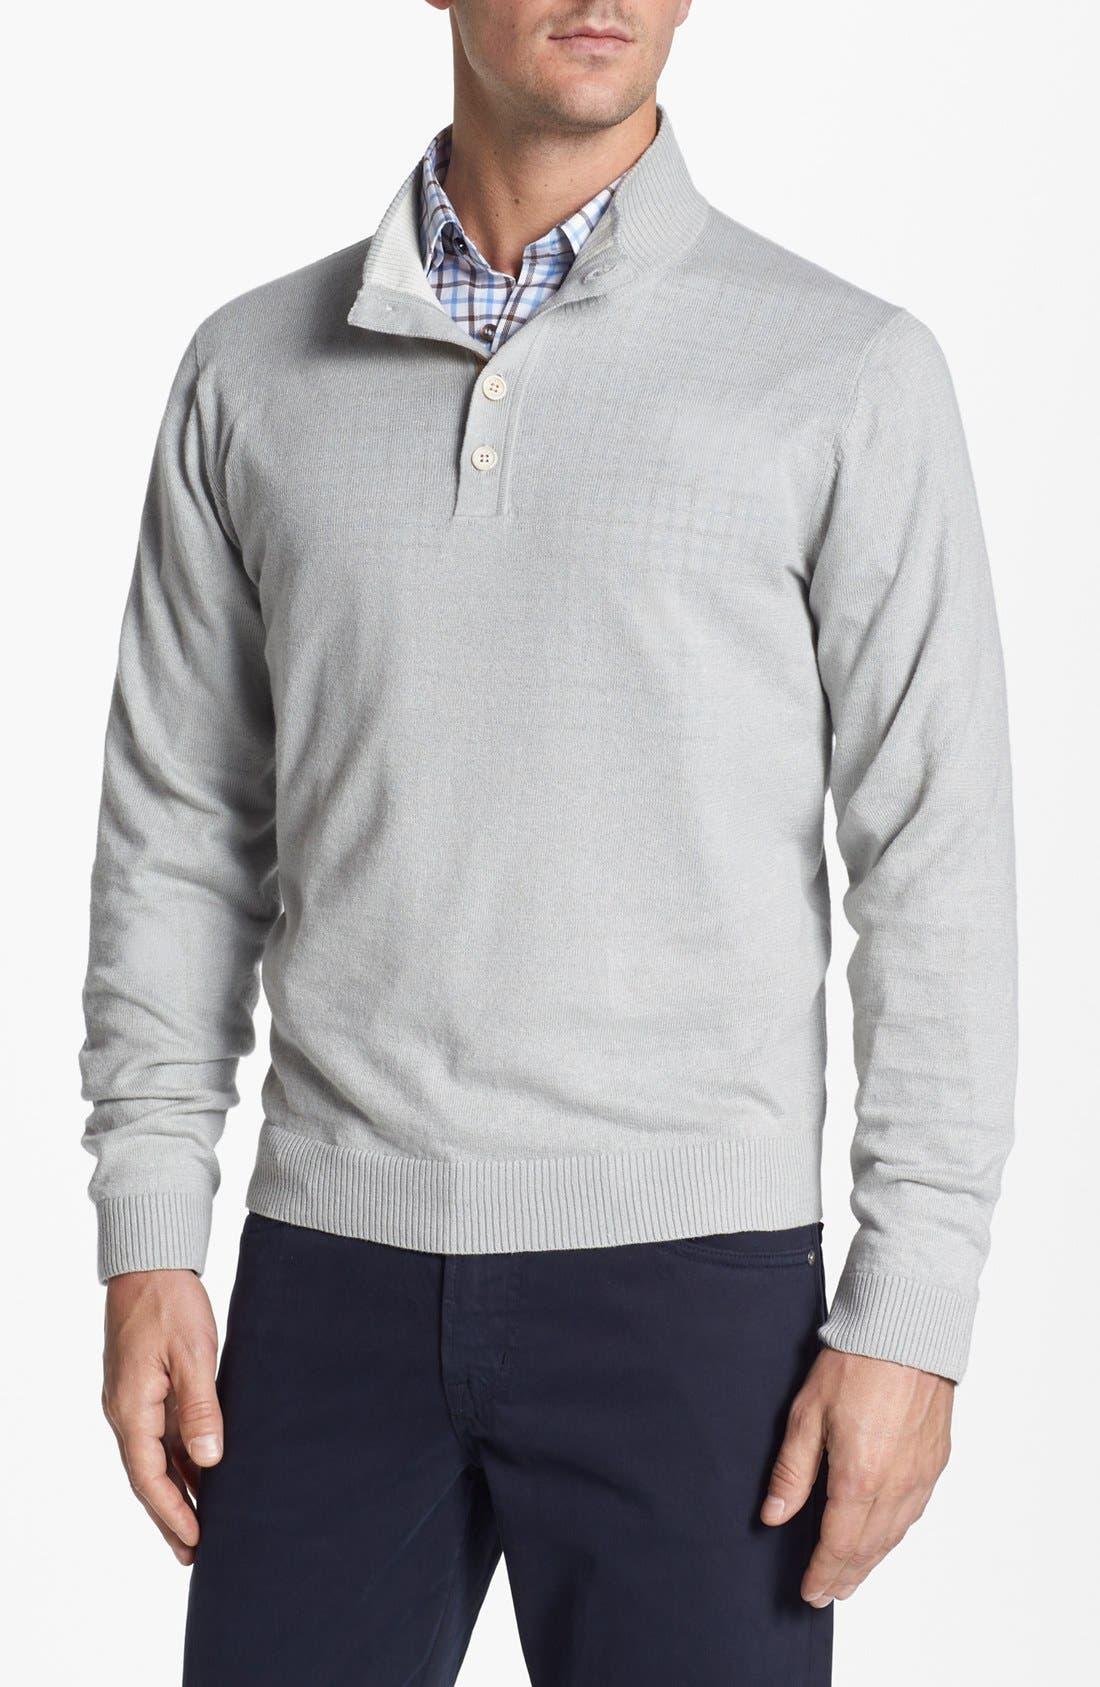 Main Image - Robert Talbott Mock Neck Linen Blend Sweater